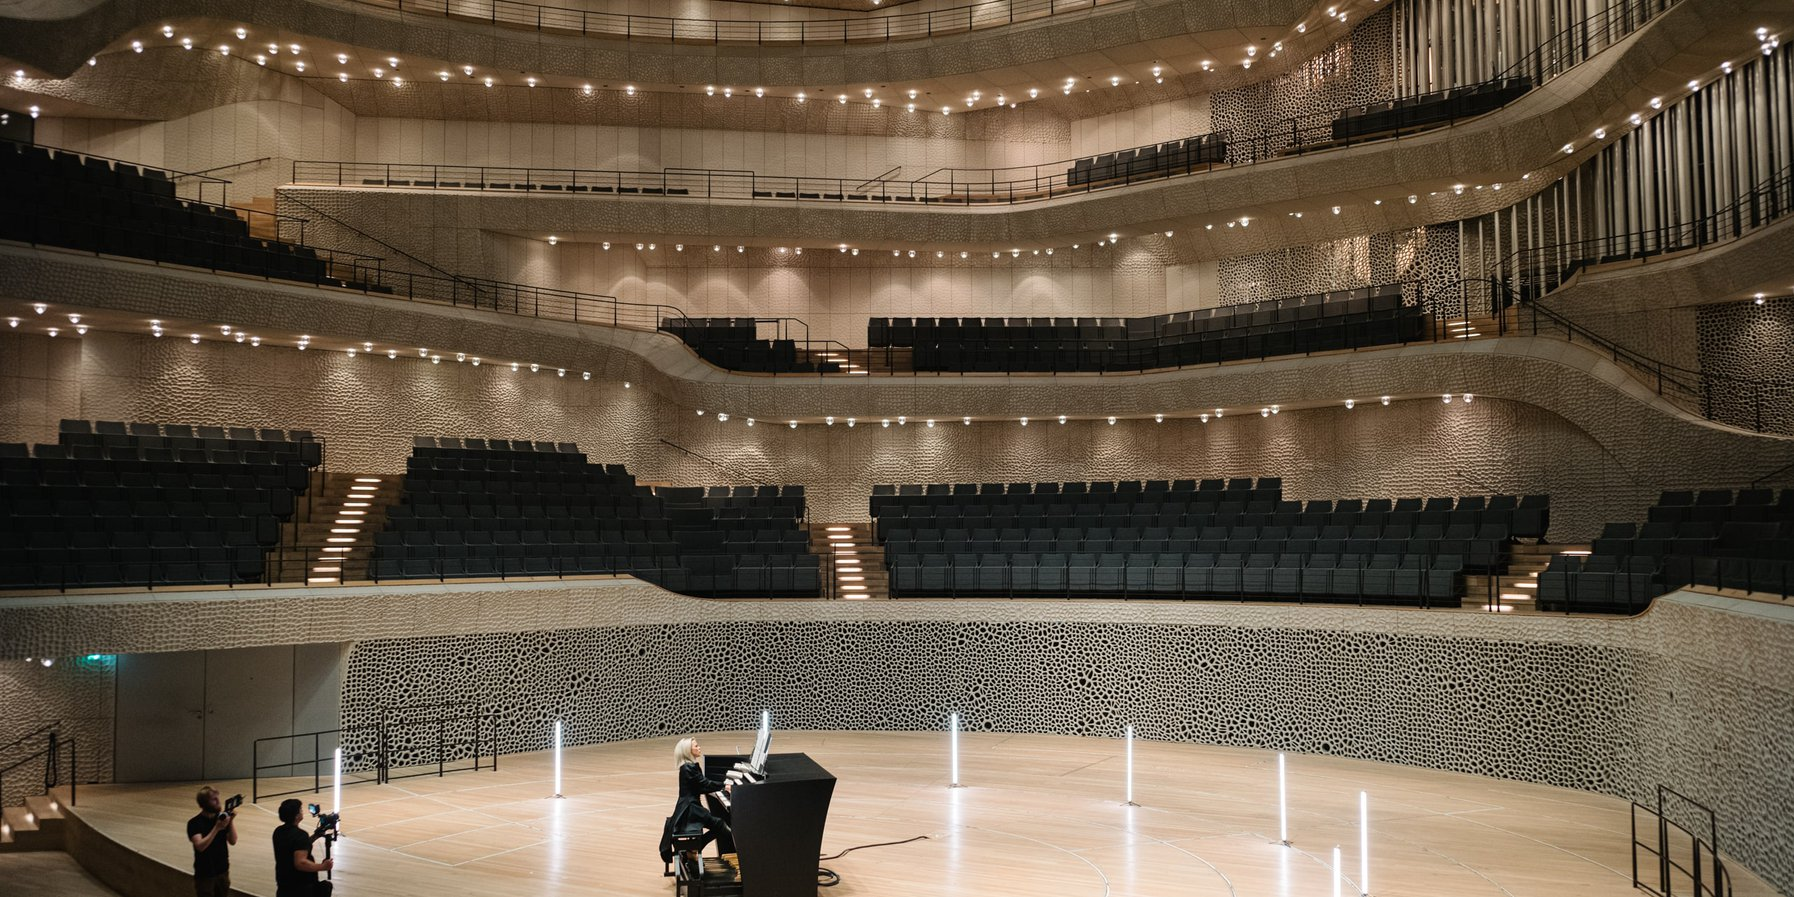 Iveta Apkalna / Großer Saal